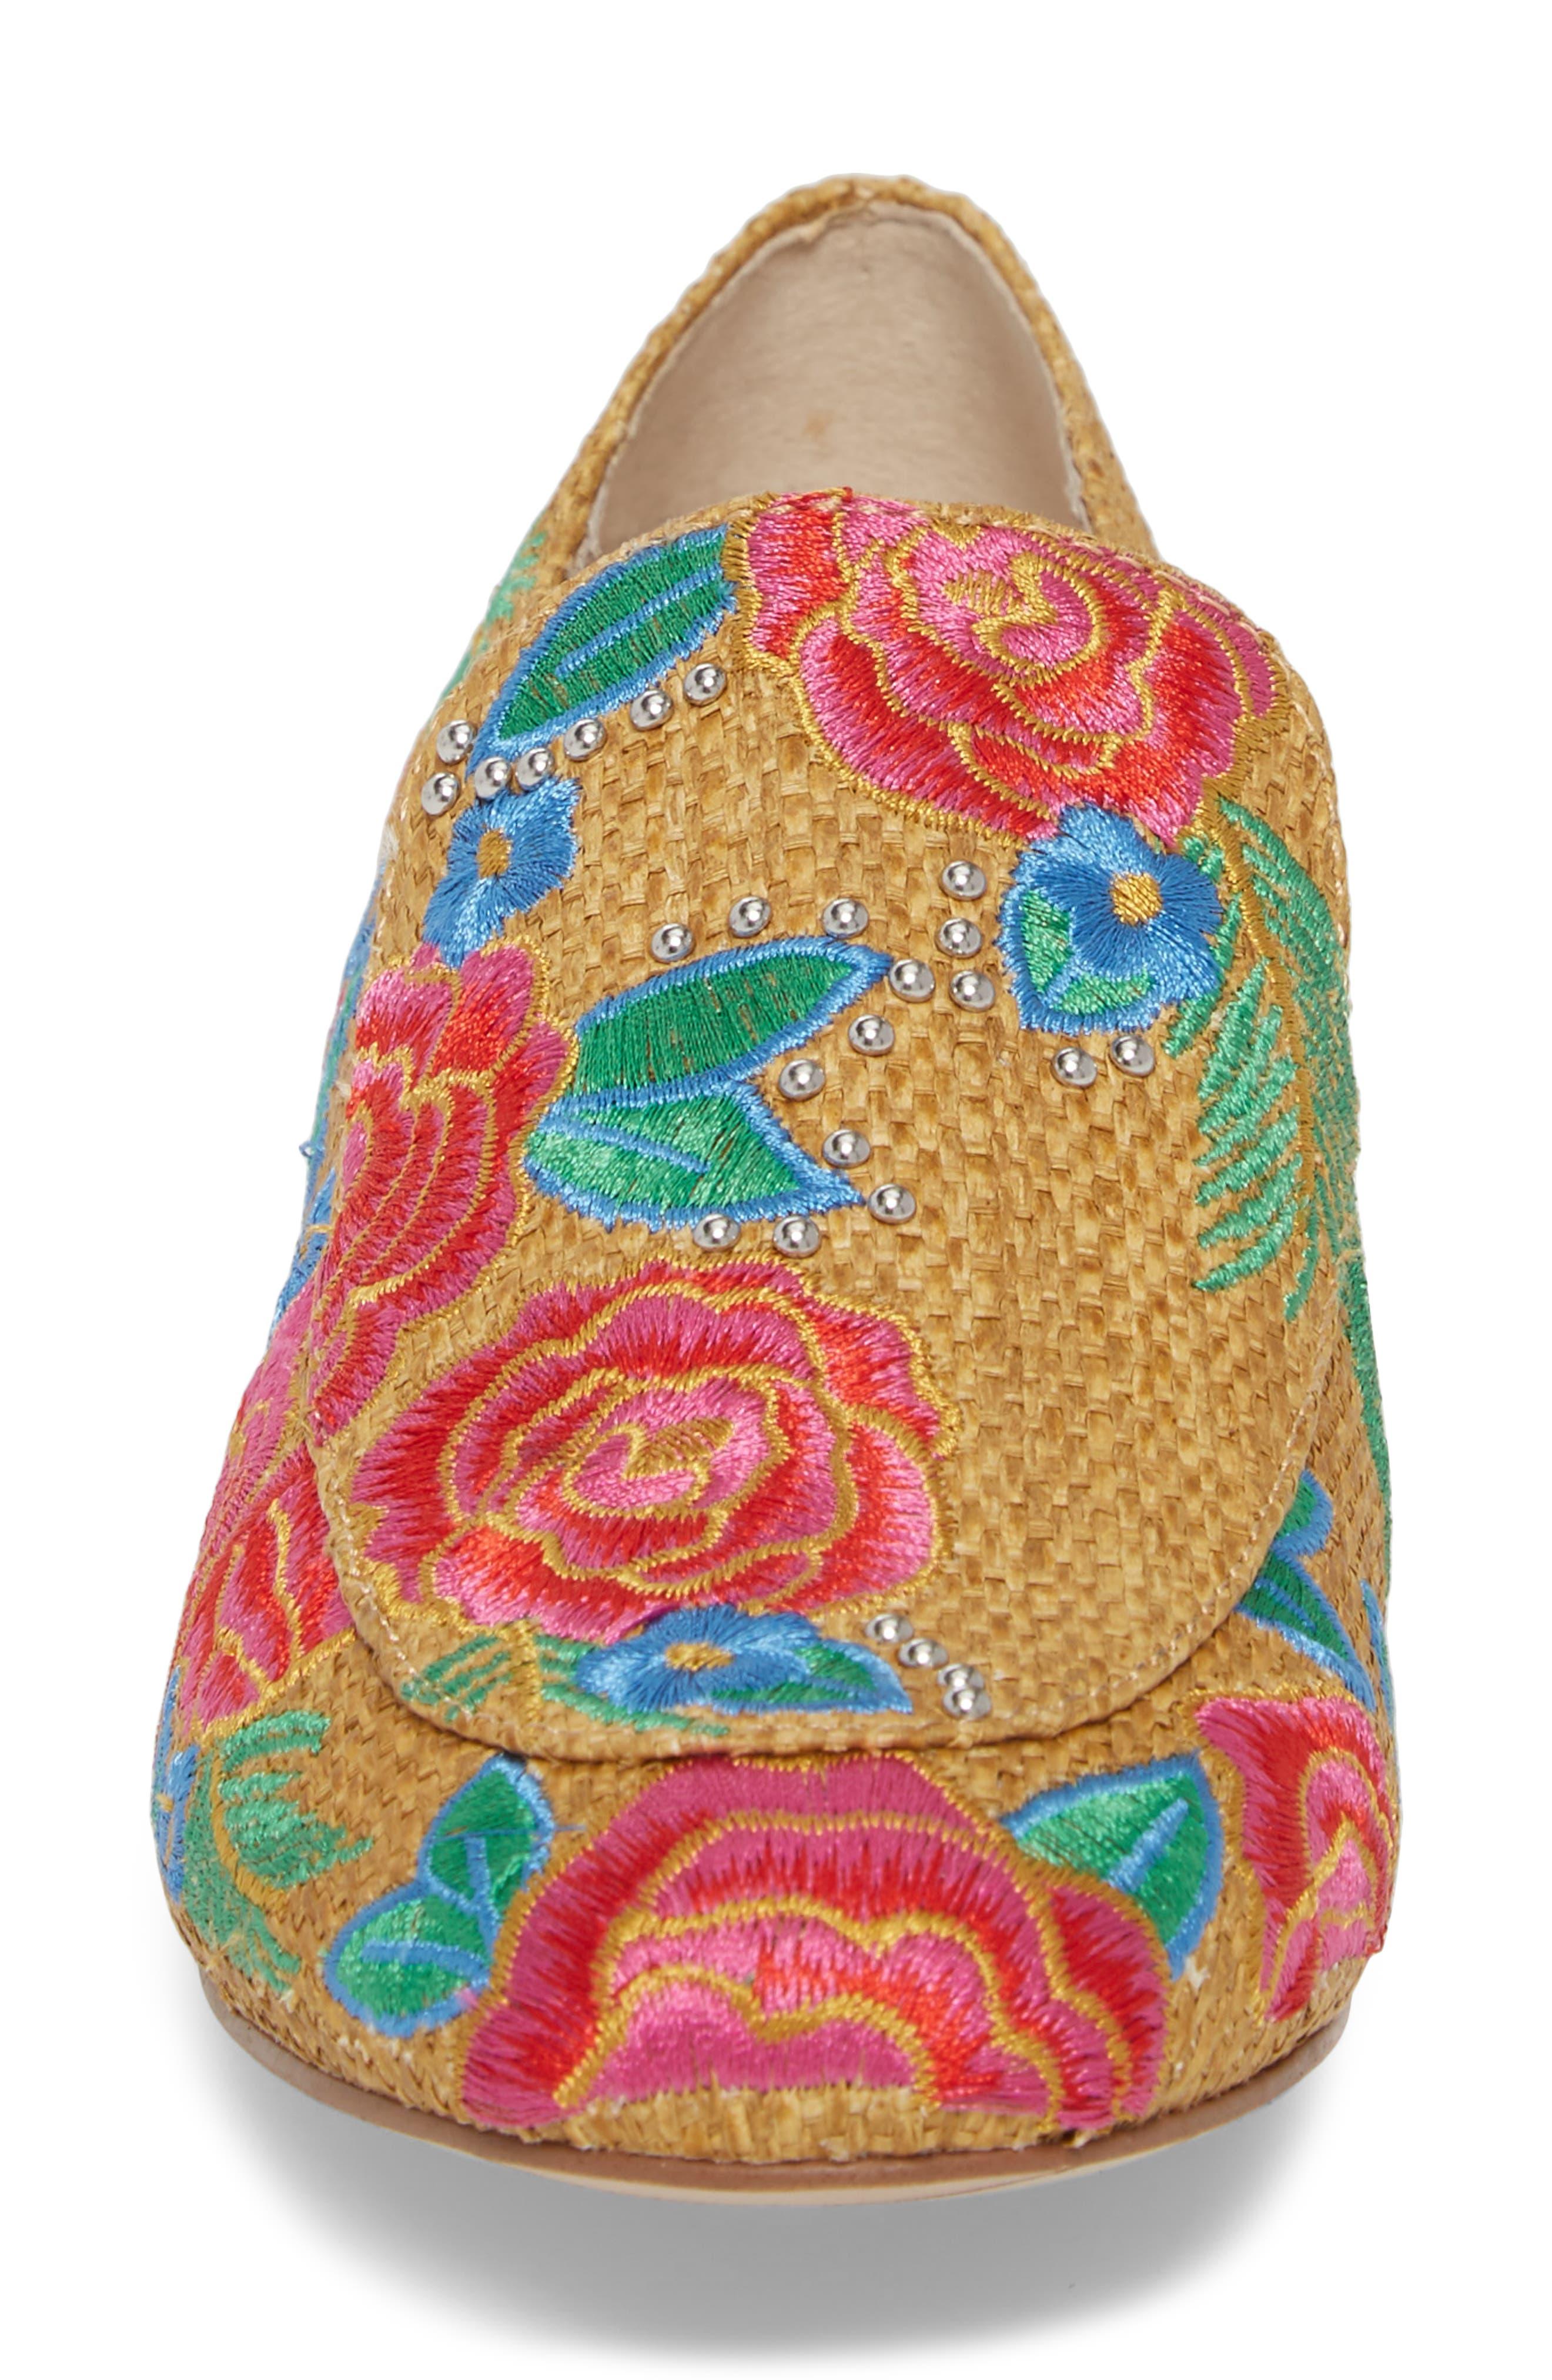 Westley Slip-On,                             Alternate thumbnail 4, color,                             Natural Raffia Fabric